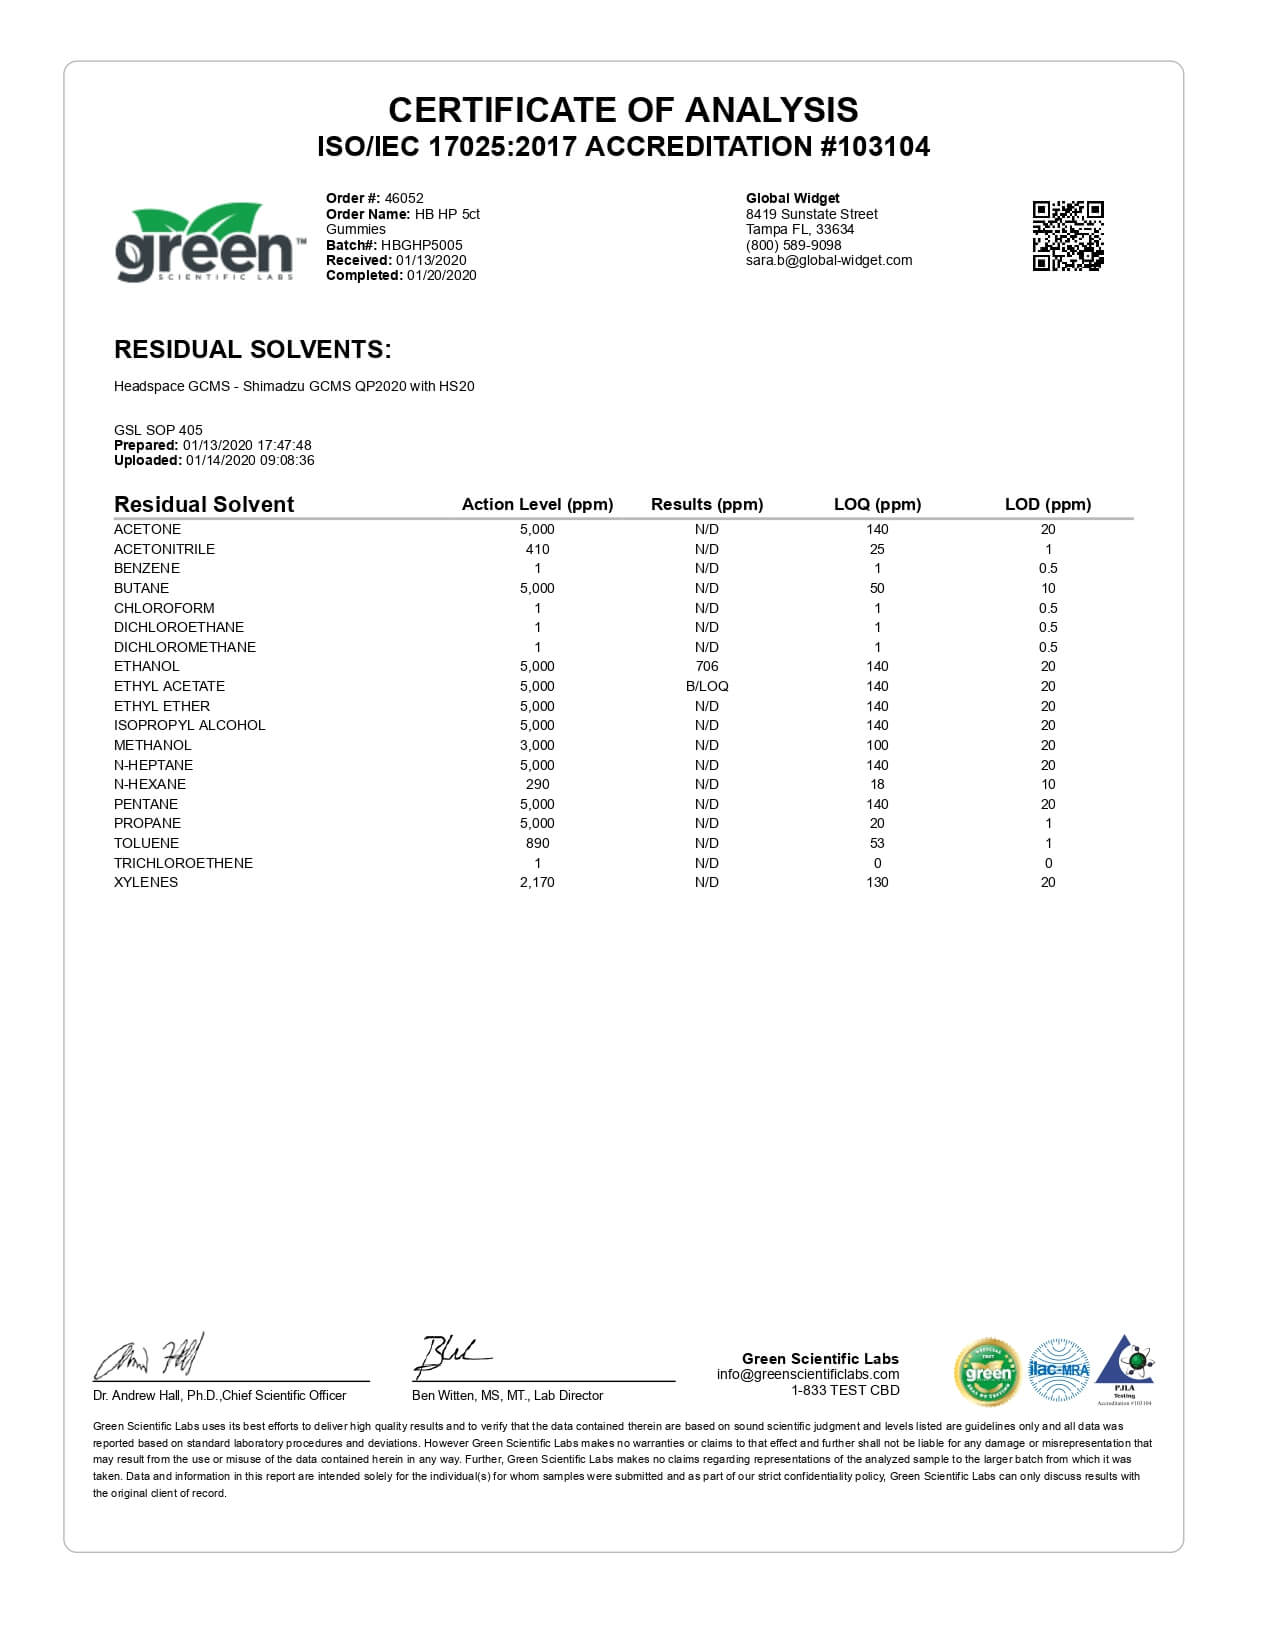 Hemp Bombs CBD Edible High Potency Gummies 125mg Lab Report